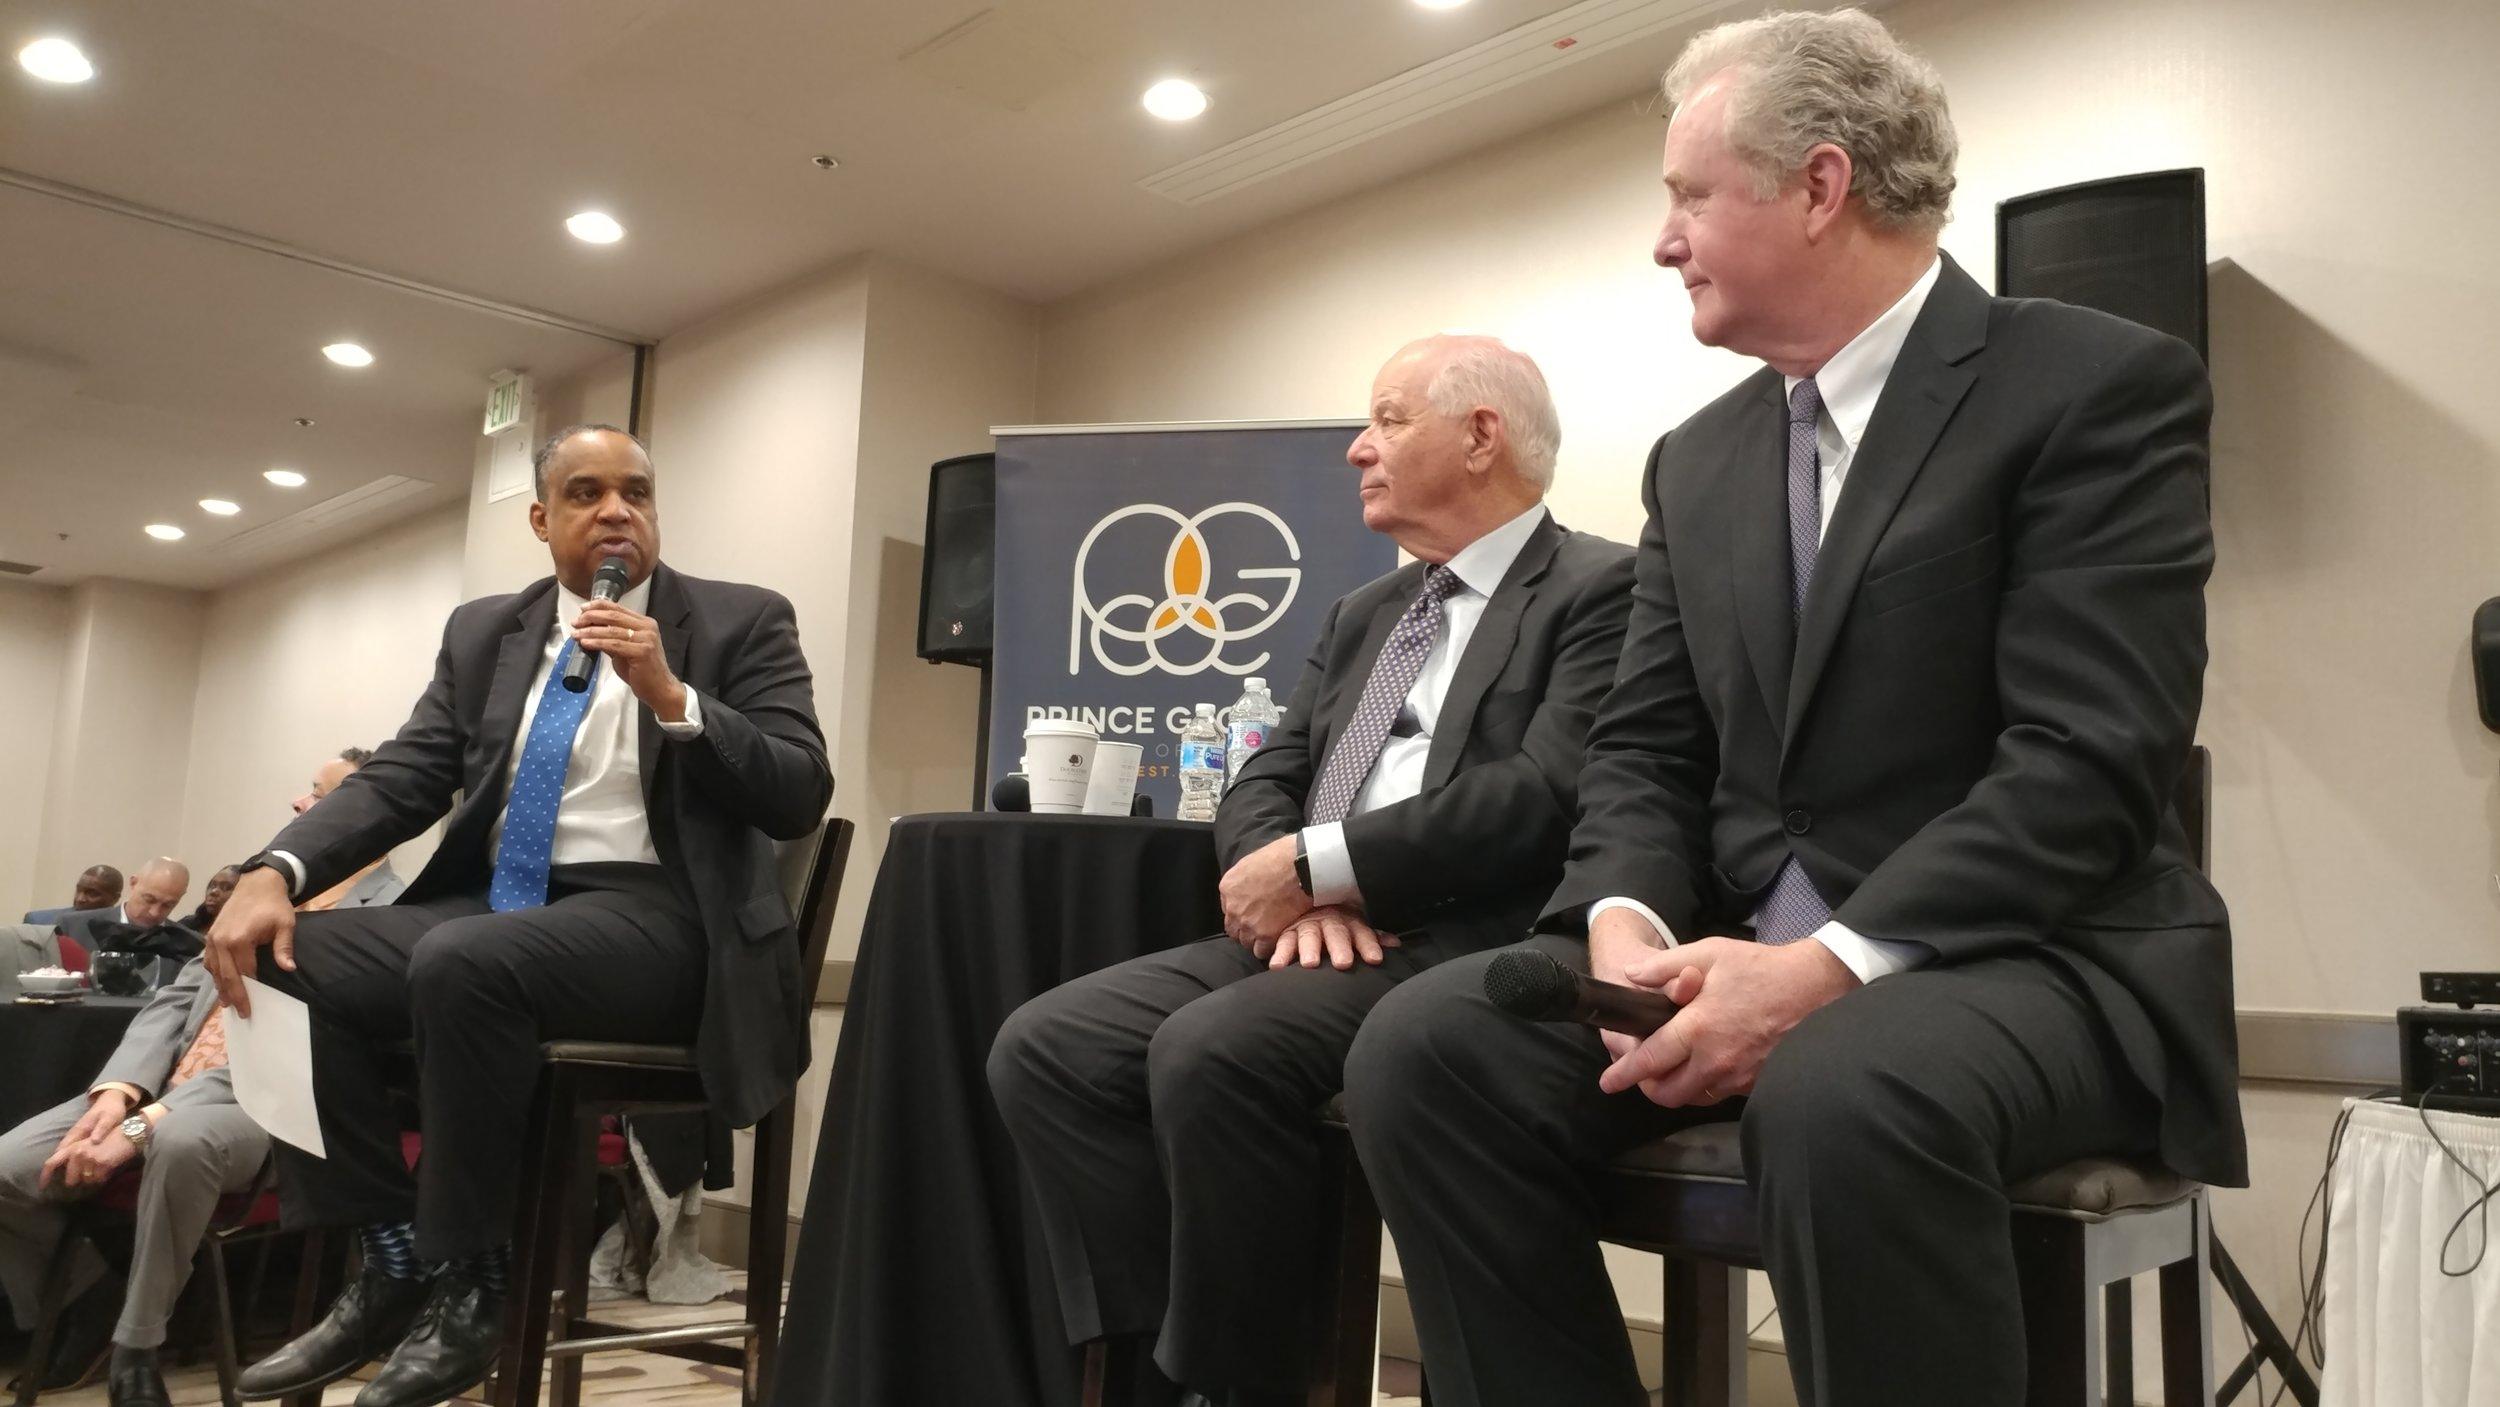 PGCOC President and CEO David Harrington with Sens. Ben Cardin and Chris Van Hollen. PHOTO: RAOUL DENNIS